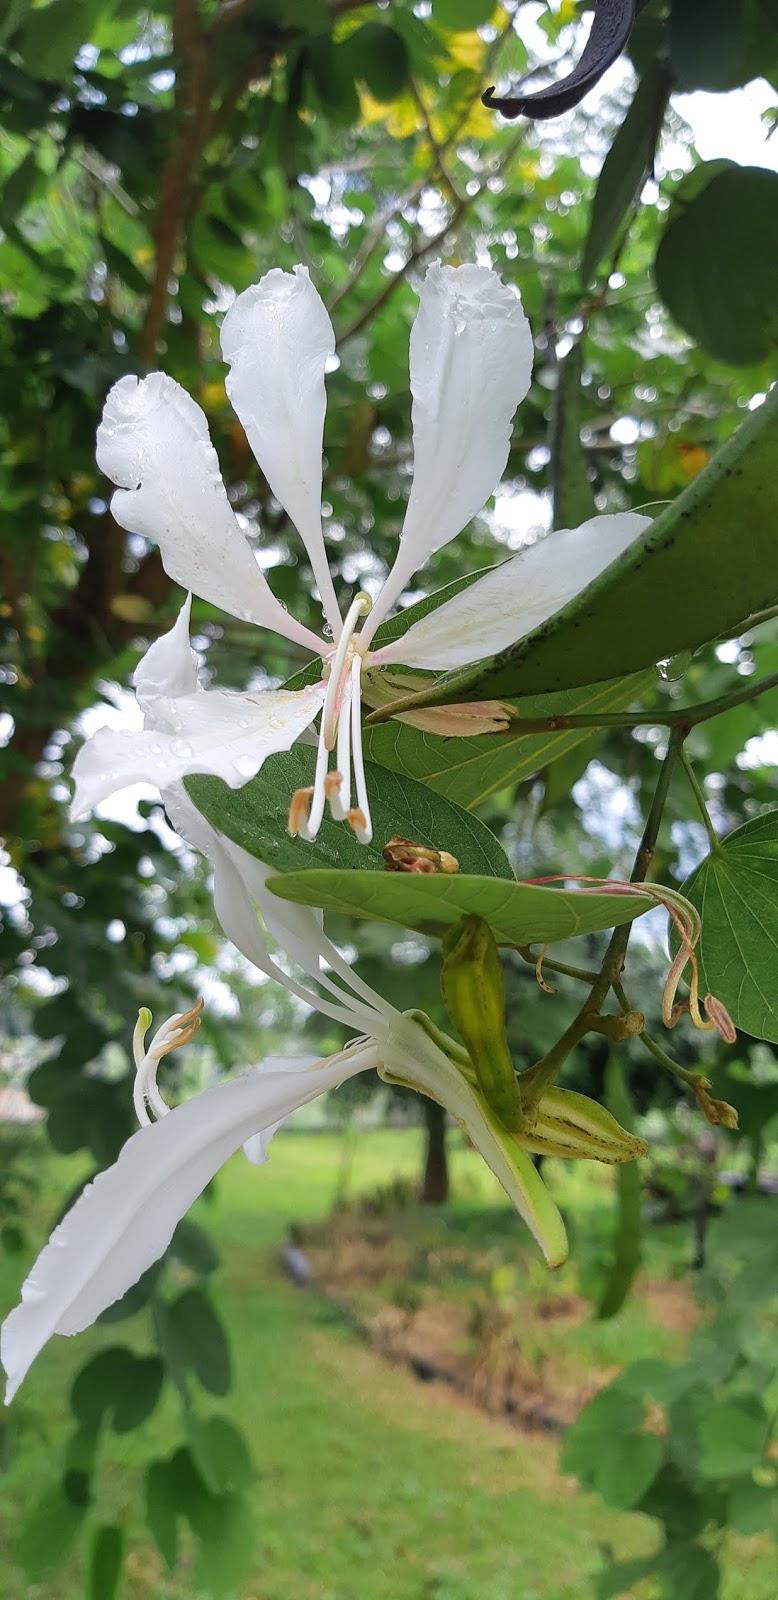 Pohon Kupu Kupu : pohon, Pohon, KUPU,, ANGGREK, HONGKONG, Bauhinia, Blakean, PLANTER, FORESTER